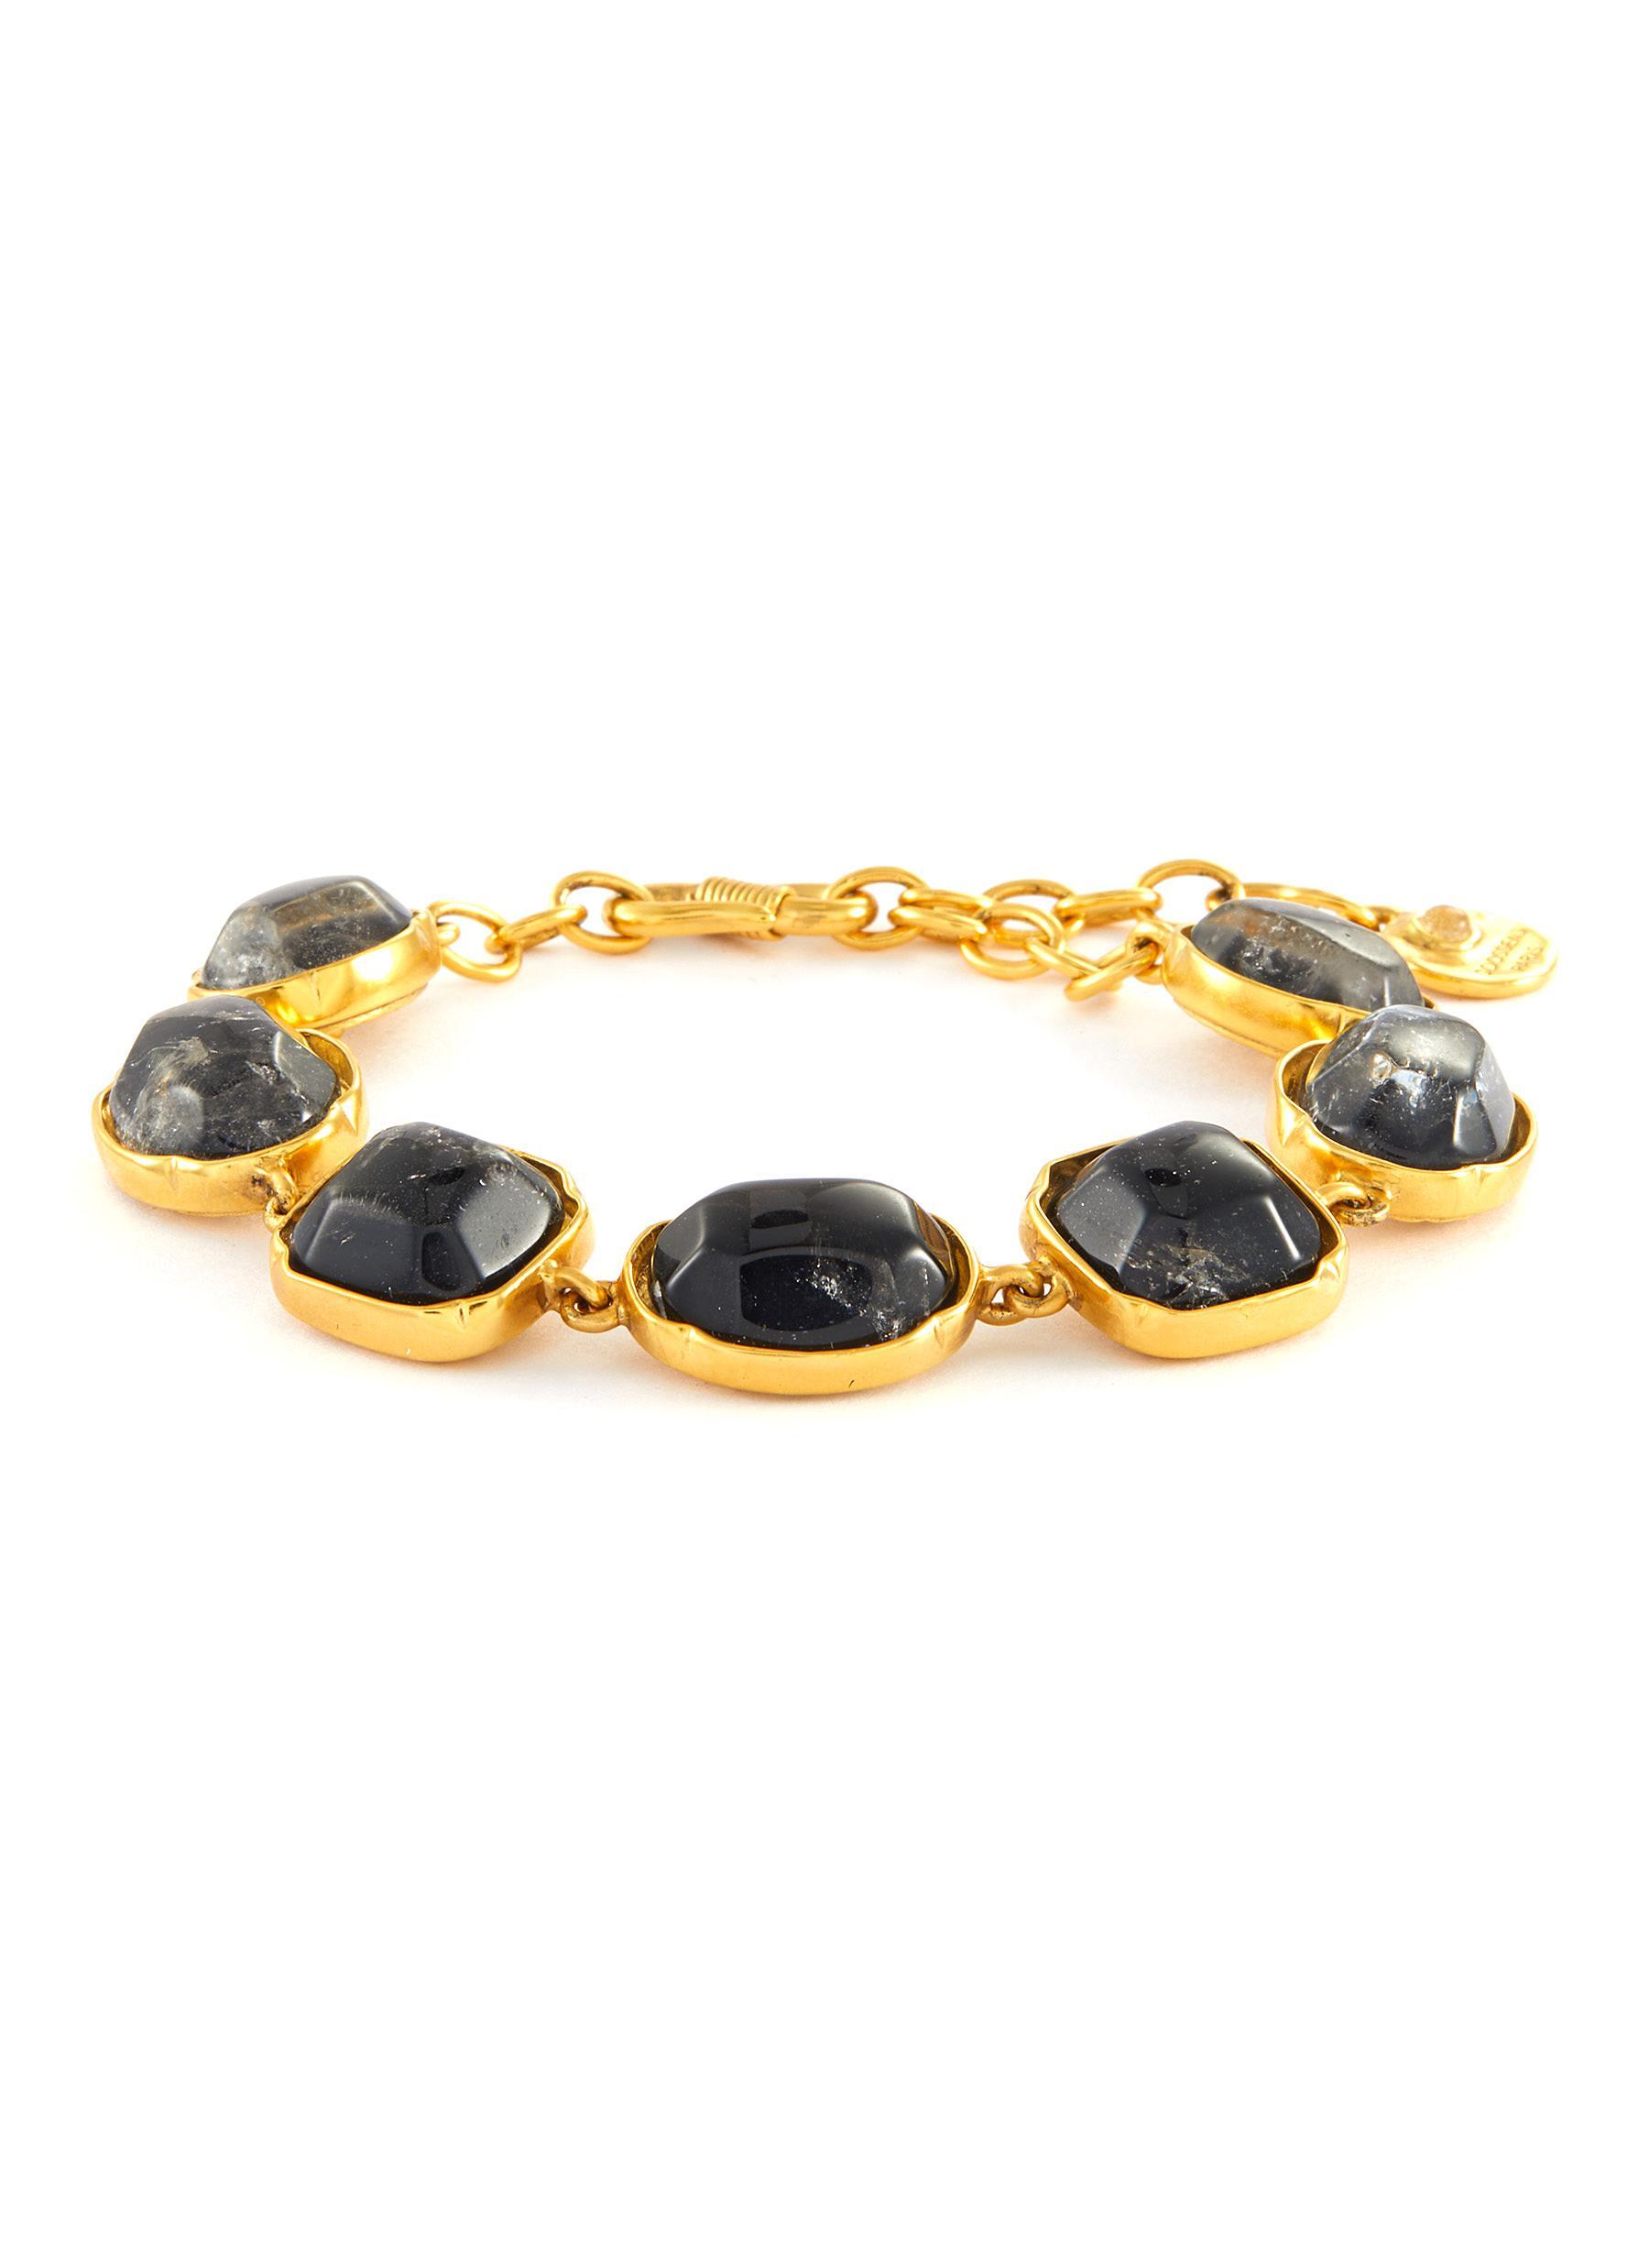 Cabochon Bead Bracelet